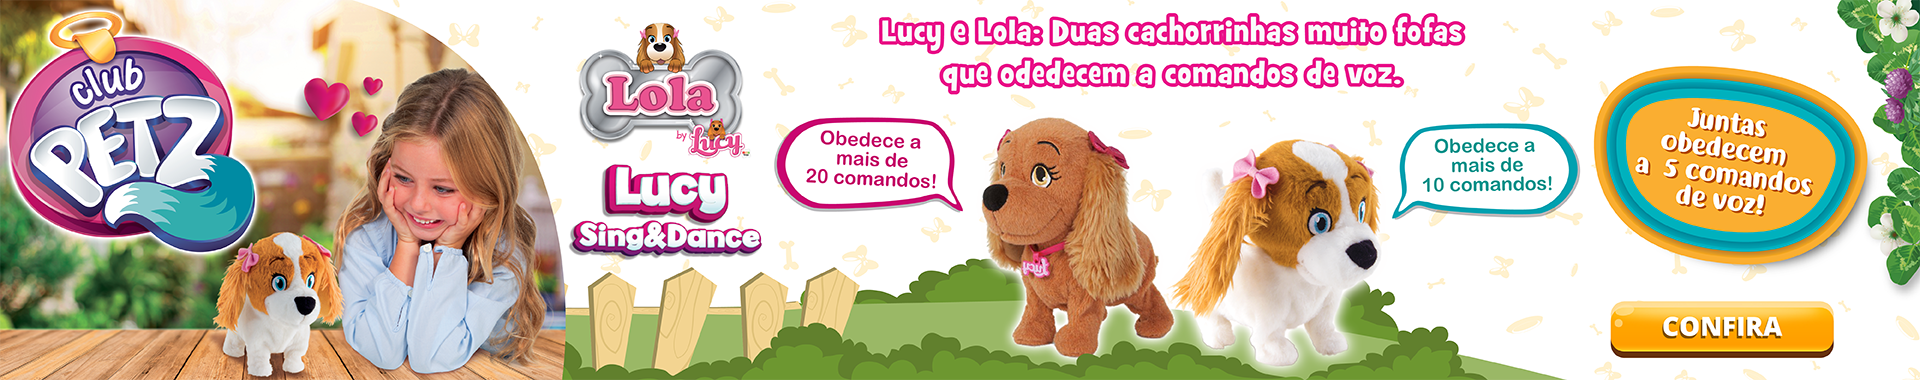 Lucy e Lola